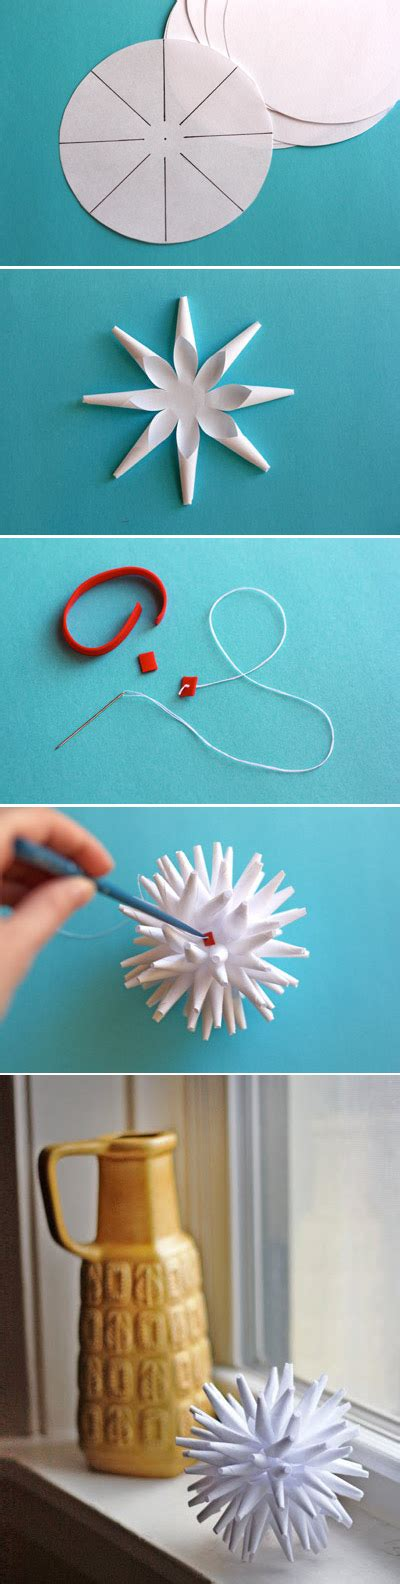 Modern Paper - modern paper porcupine ornament 40 diy home decor ideas